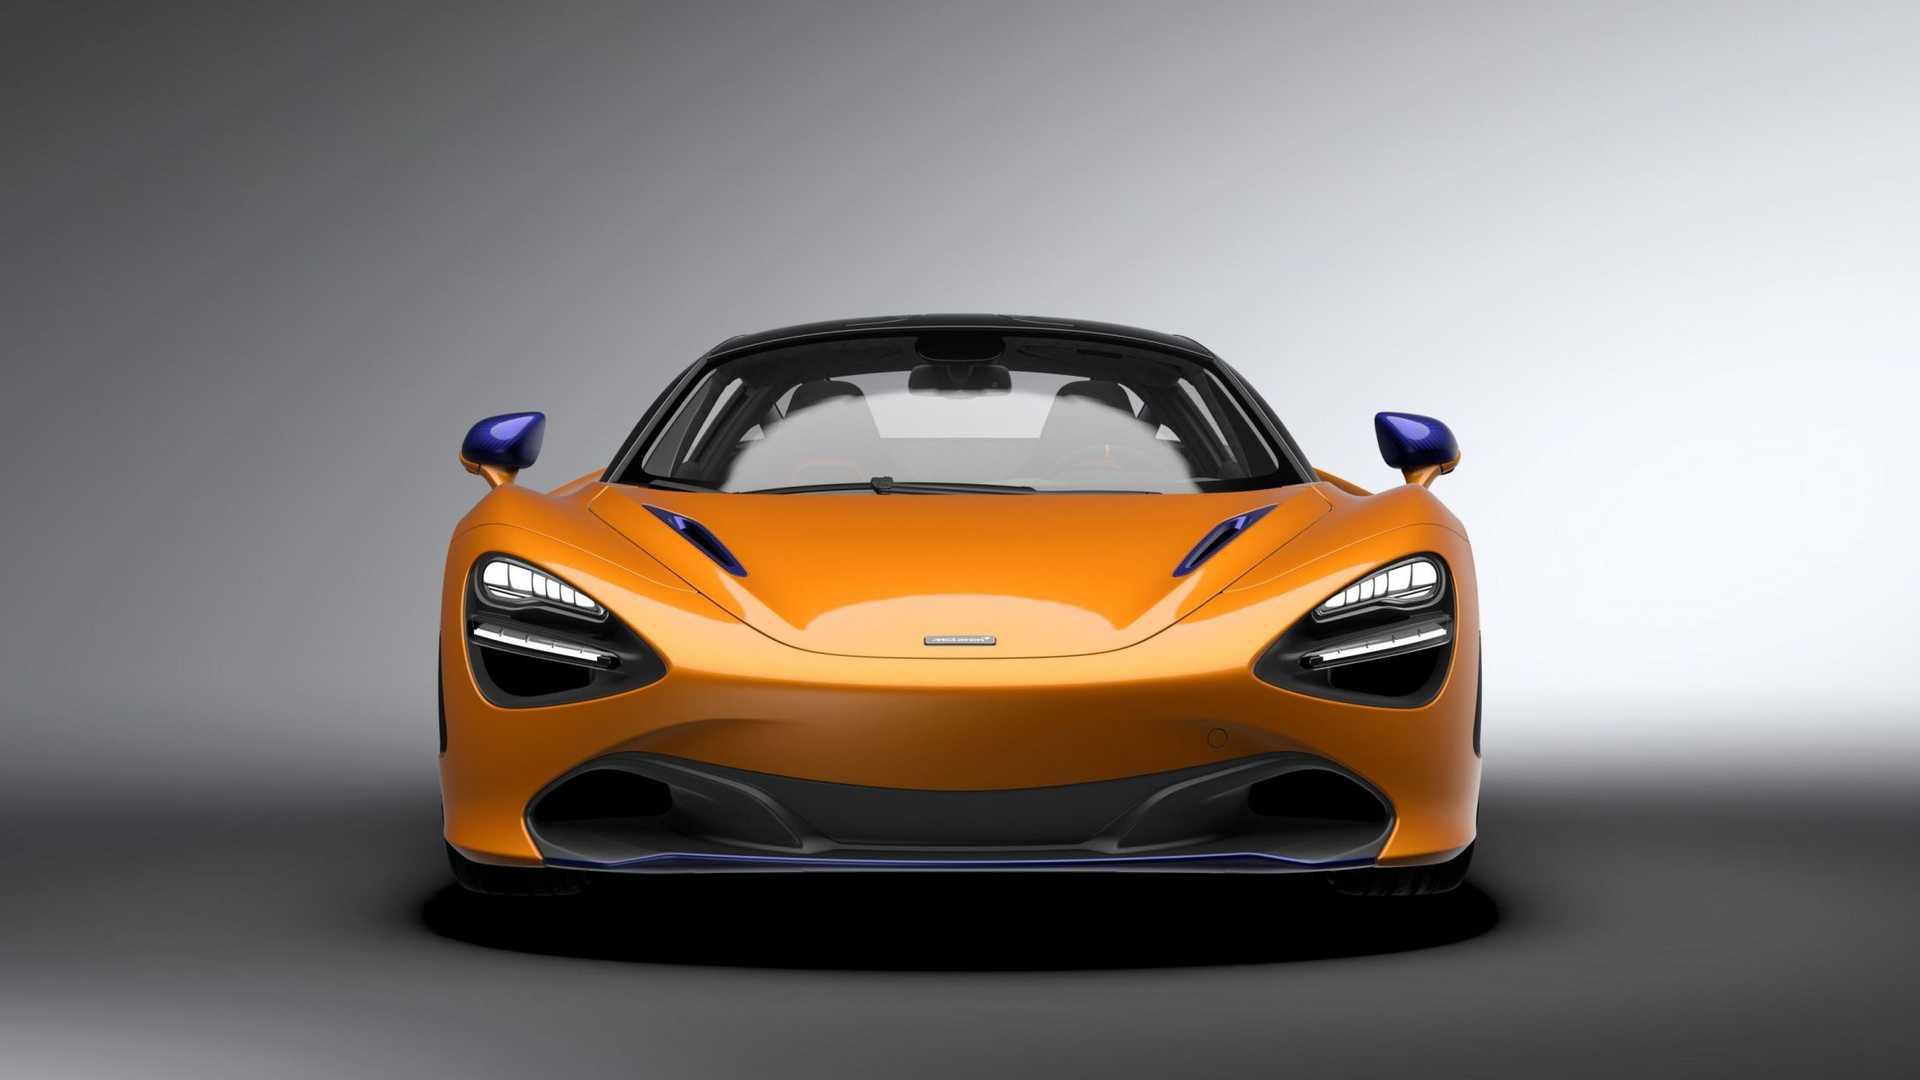 McLaren-720S-Daniel-Ricciardo-Edition-5